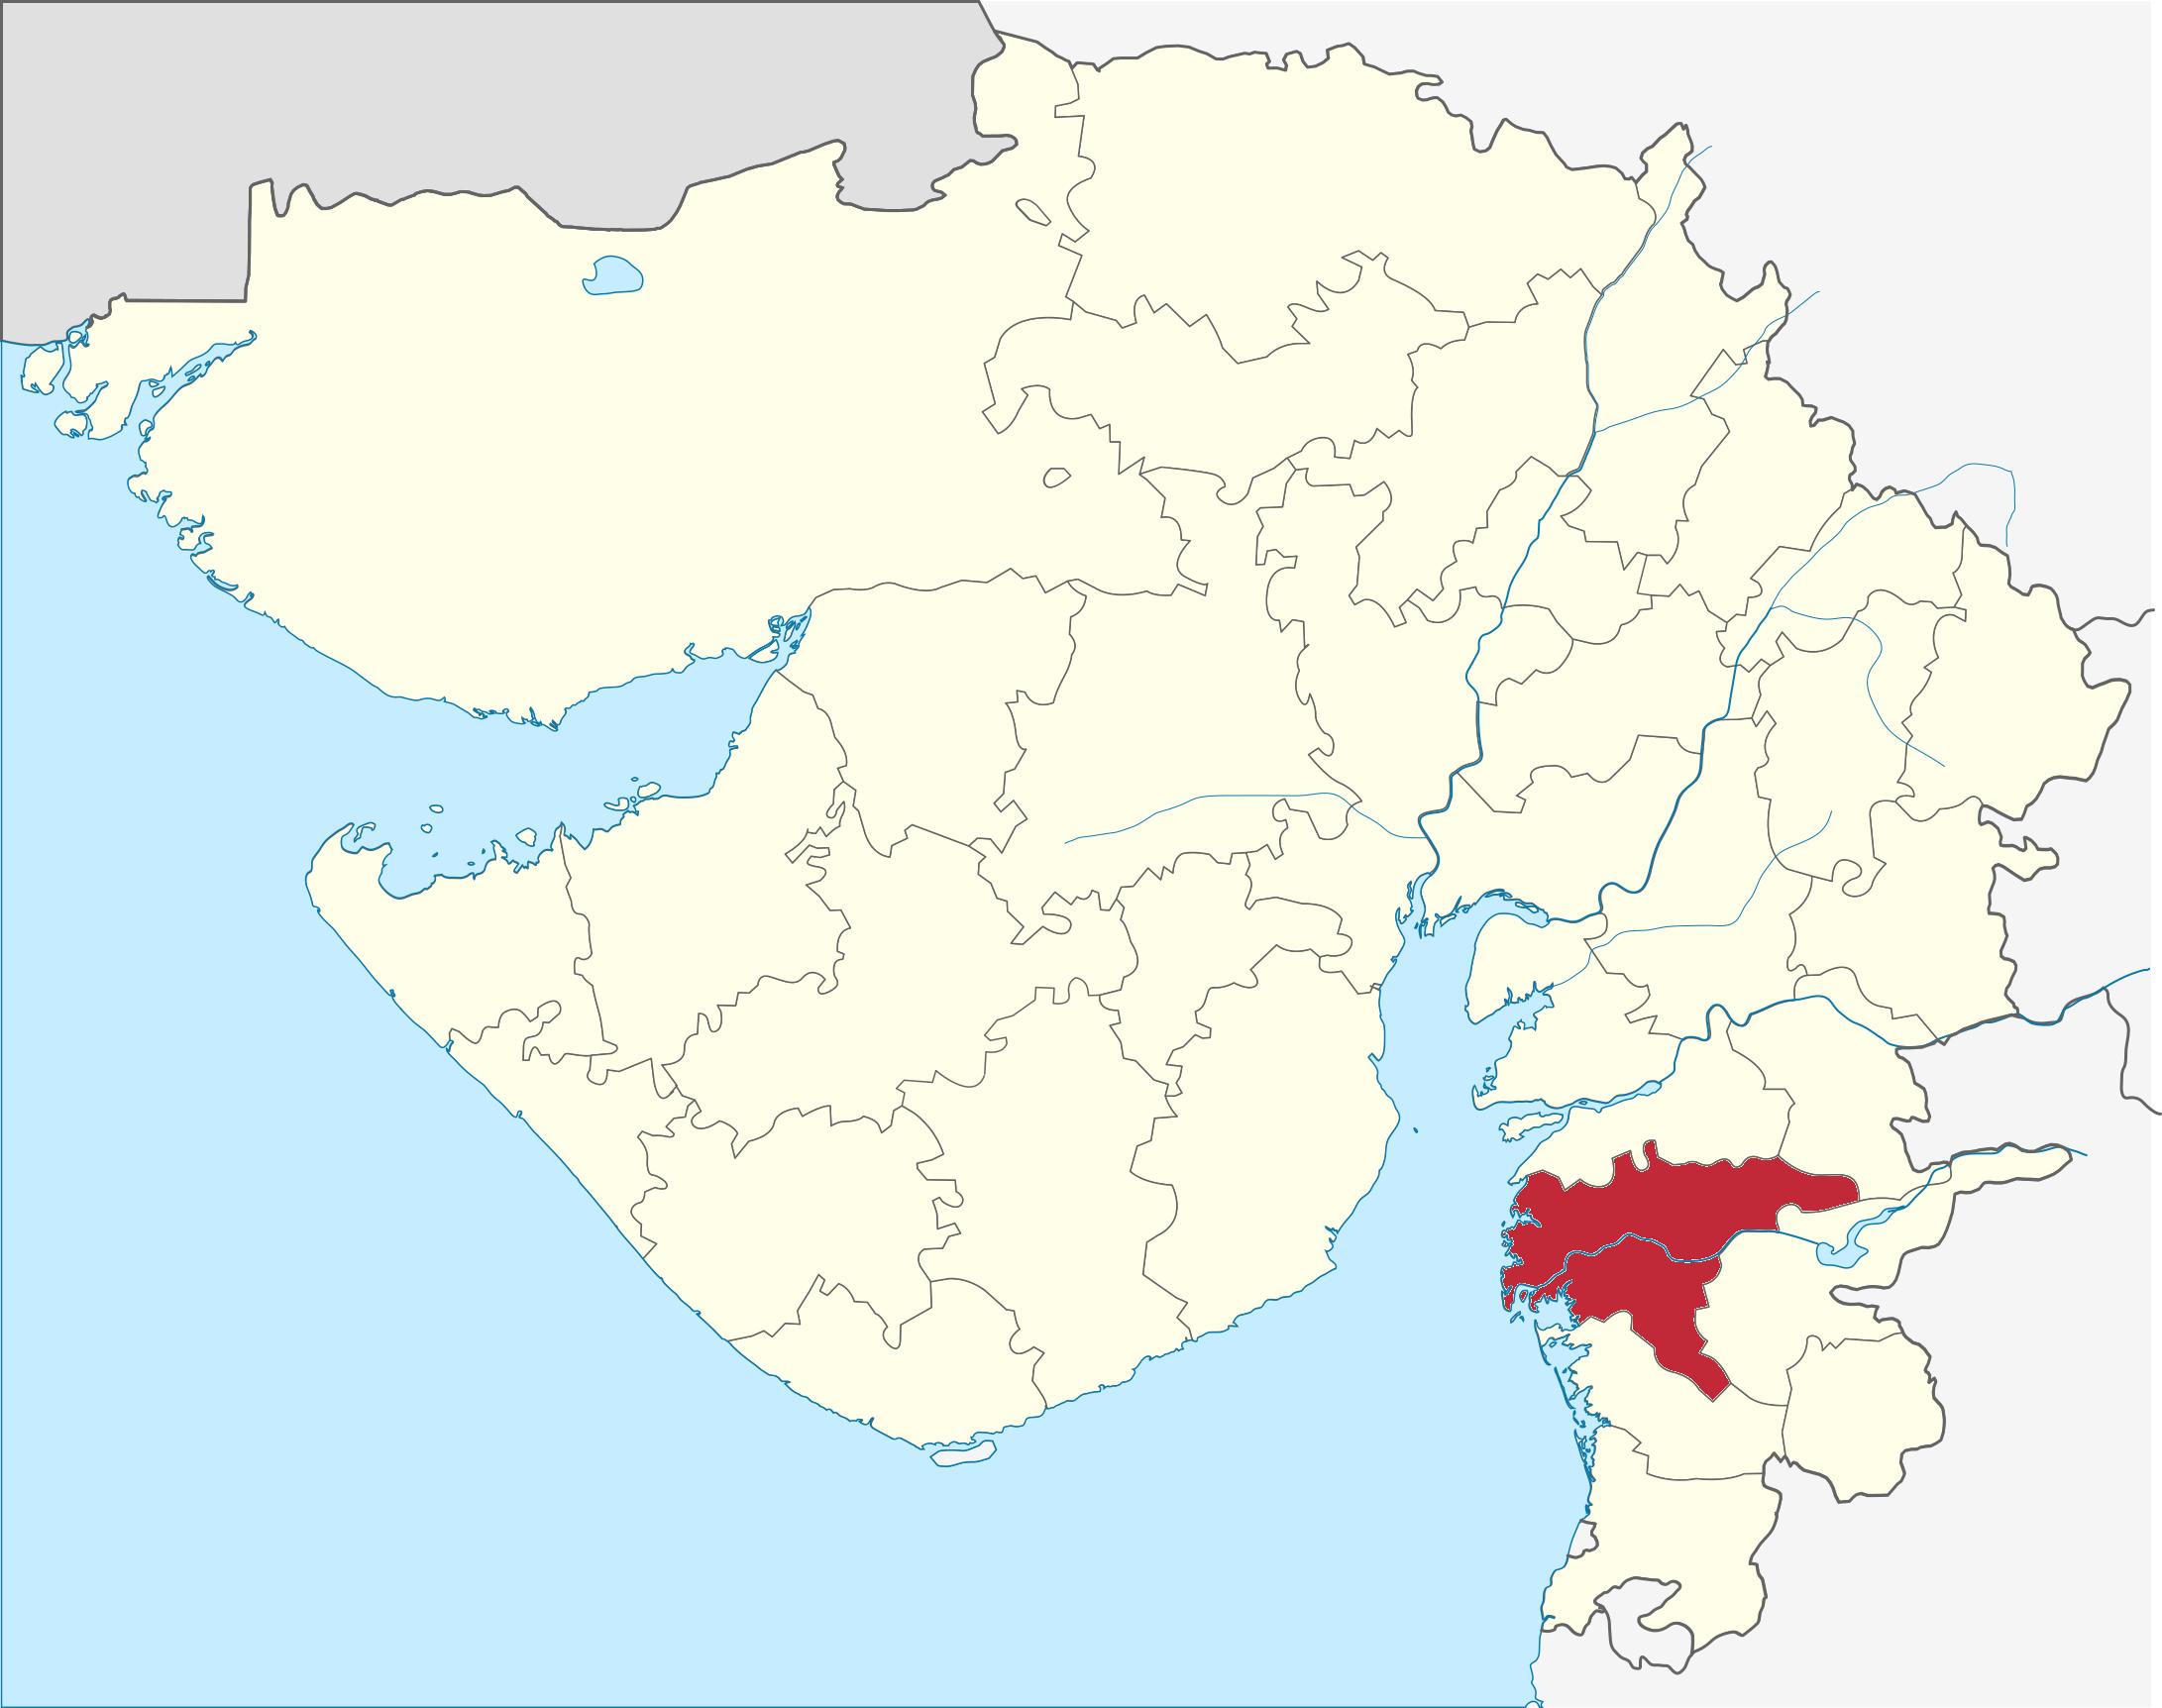 surat in india map Surat District Wikipedia surat in india map